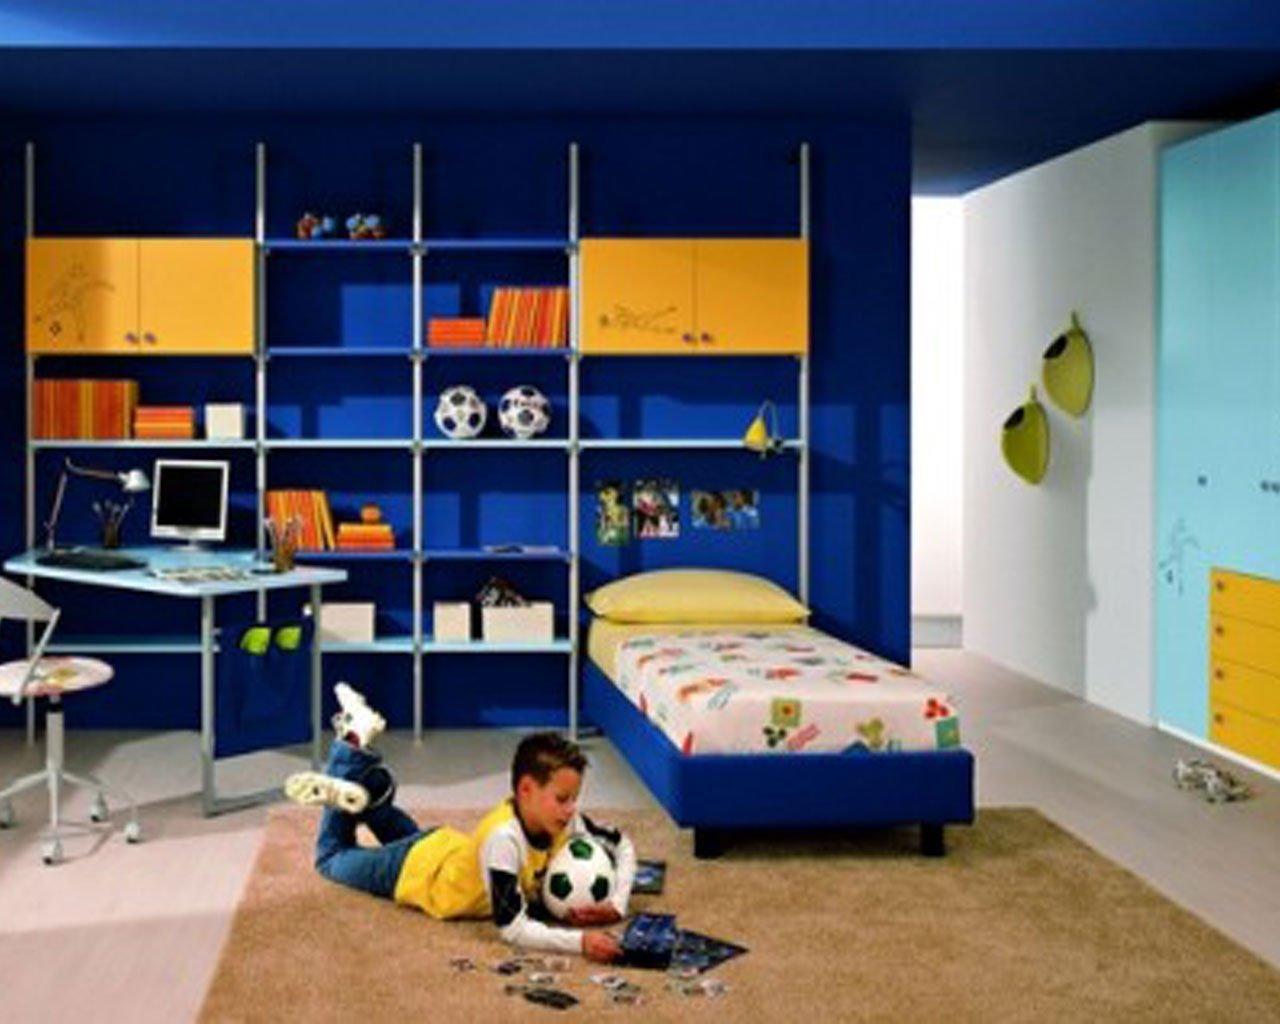 Bedroom interior for boys - Boys Bedroom Ideas Design Wallpaper Bedroom Designs For Children 2013